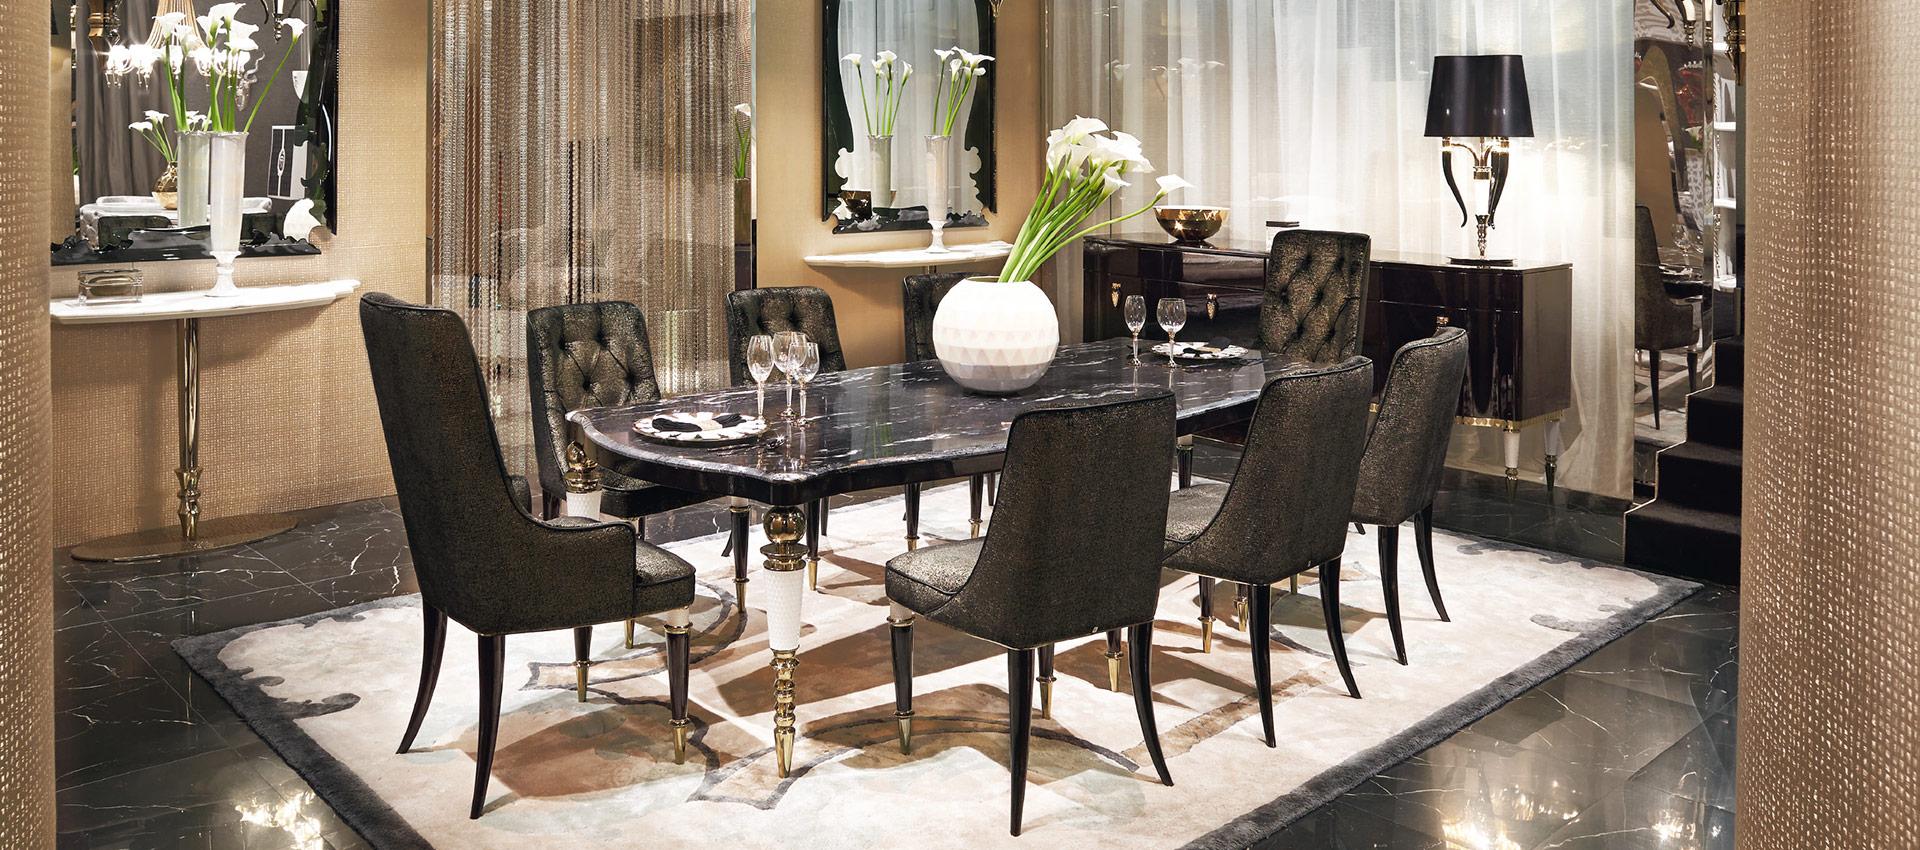 luxury furniture visionnaire